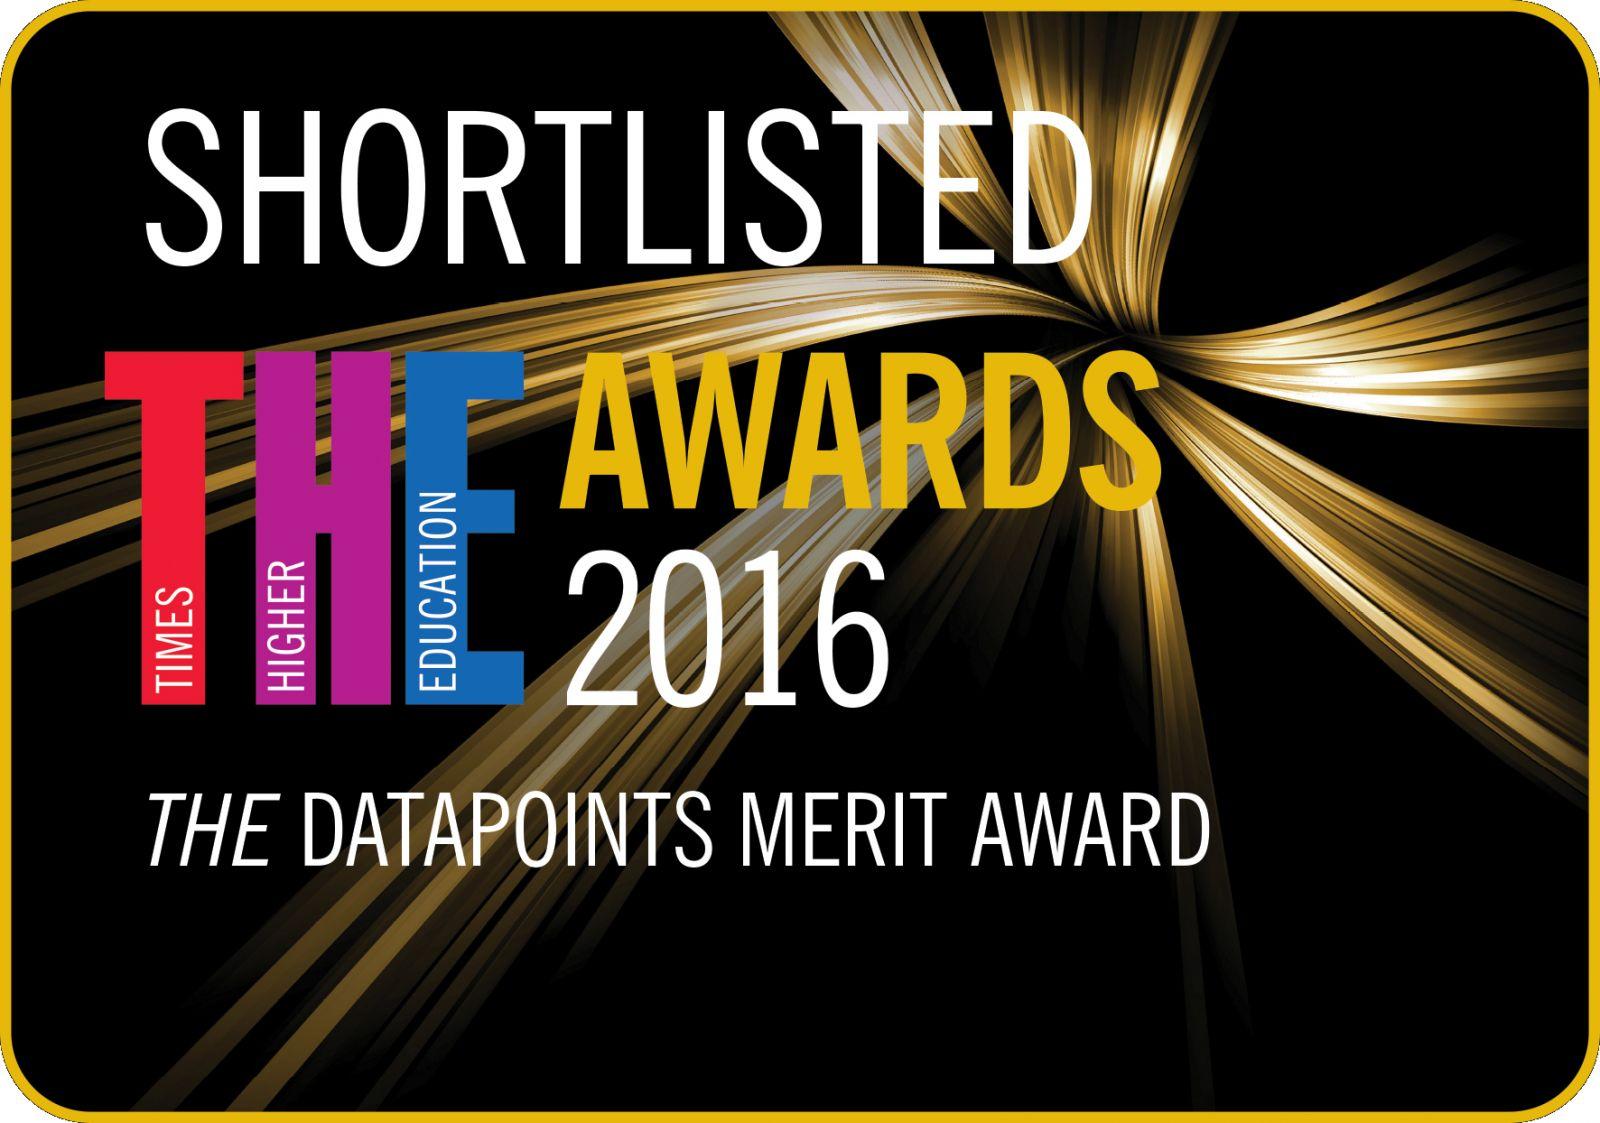 THE-Awards-2016-THE-DataPoints-Merit-Award-